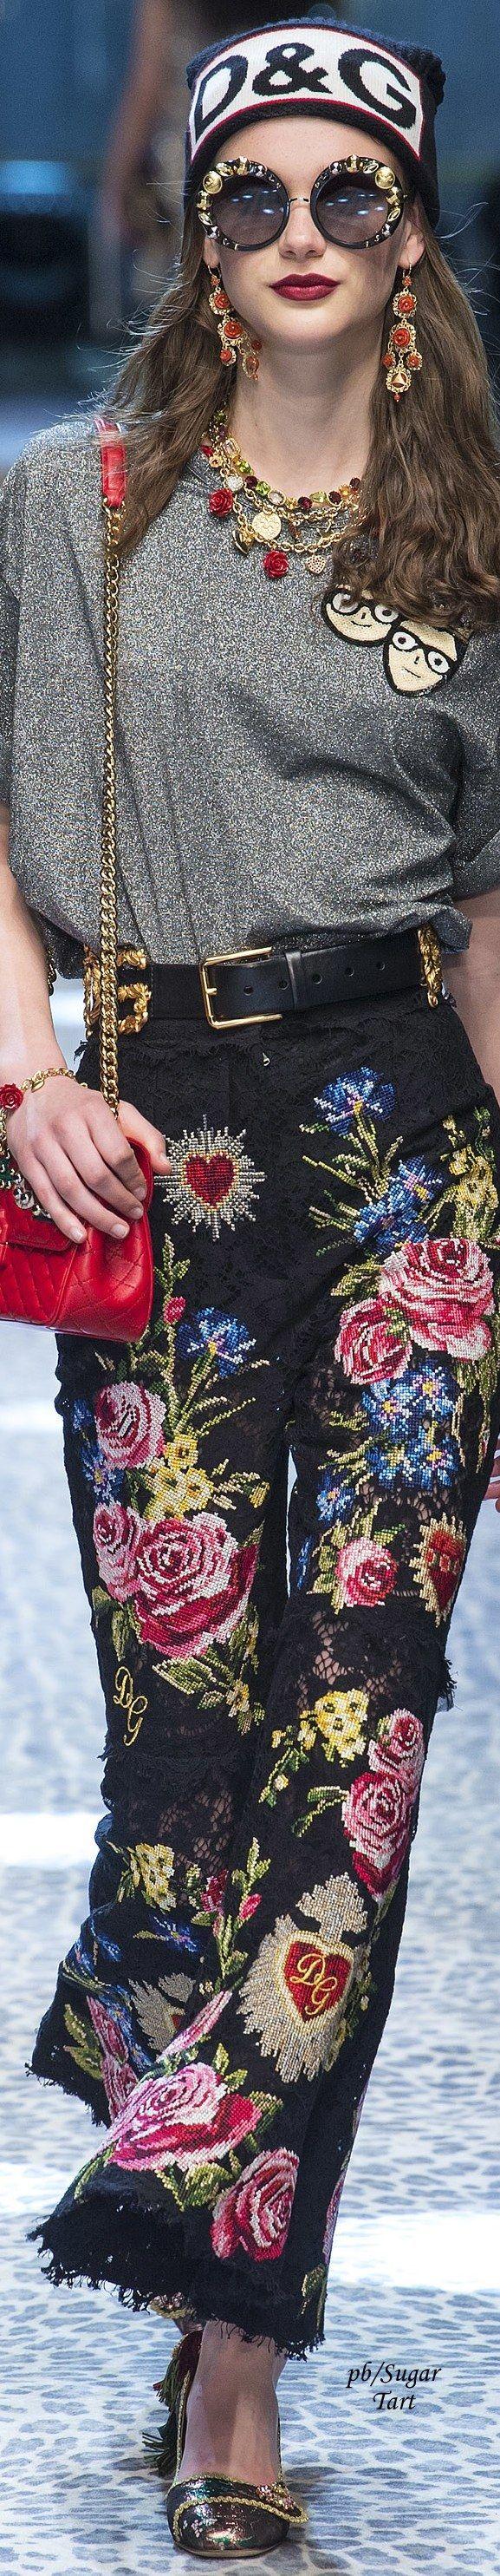 Dolce & Gabbana Fall 2017 *☆ ♡ ριntєrєѕt: ♕ριnkɑndvєlvєƗ♕  ιnstagram: thєριnkɑndvєlvєƗ   ριnkɑndvєlvєƗ.com #pinkandvelvet #fashion